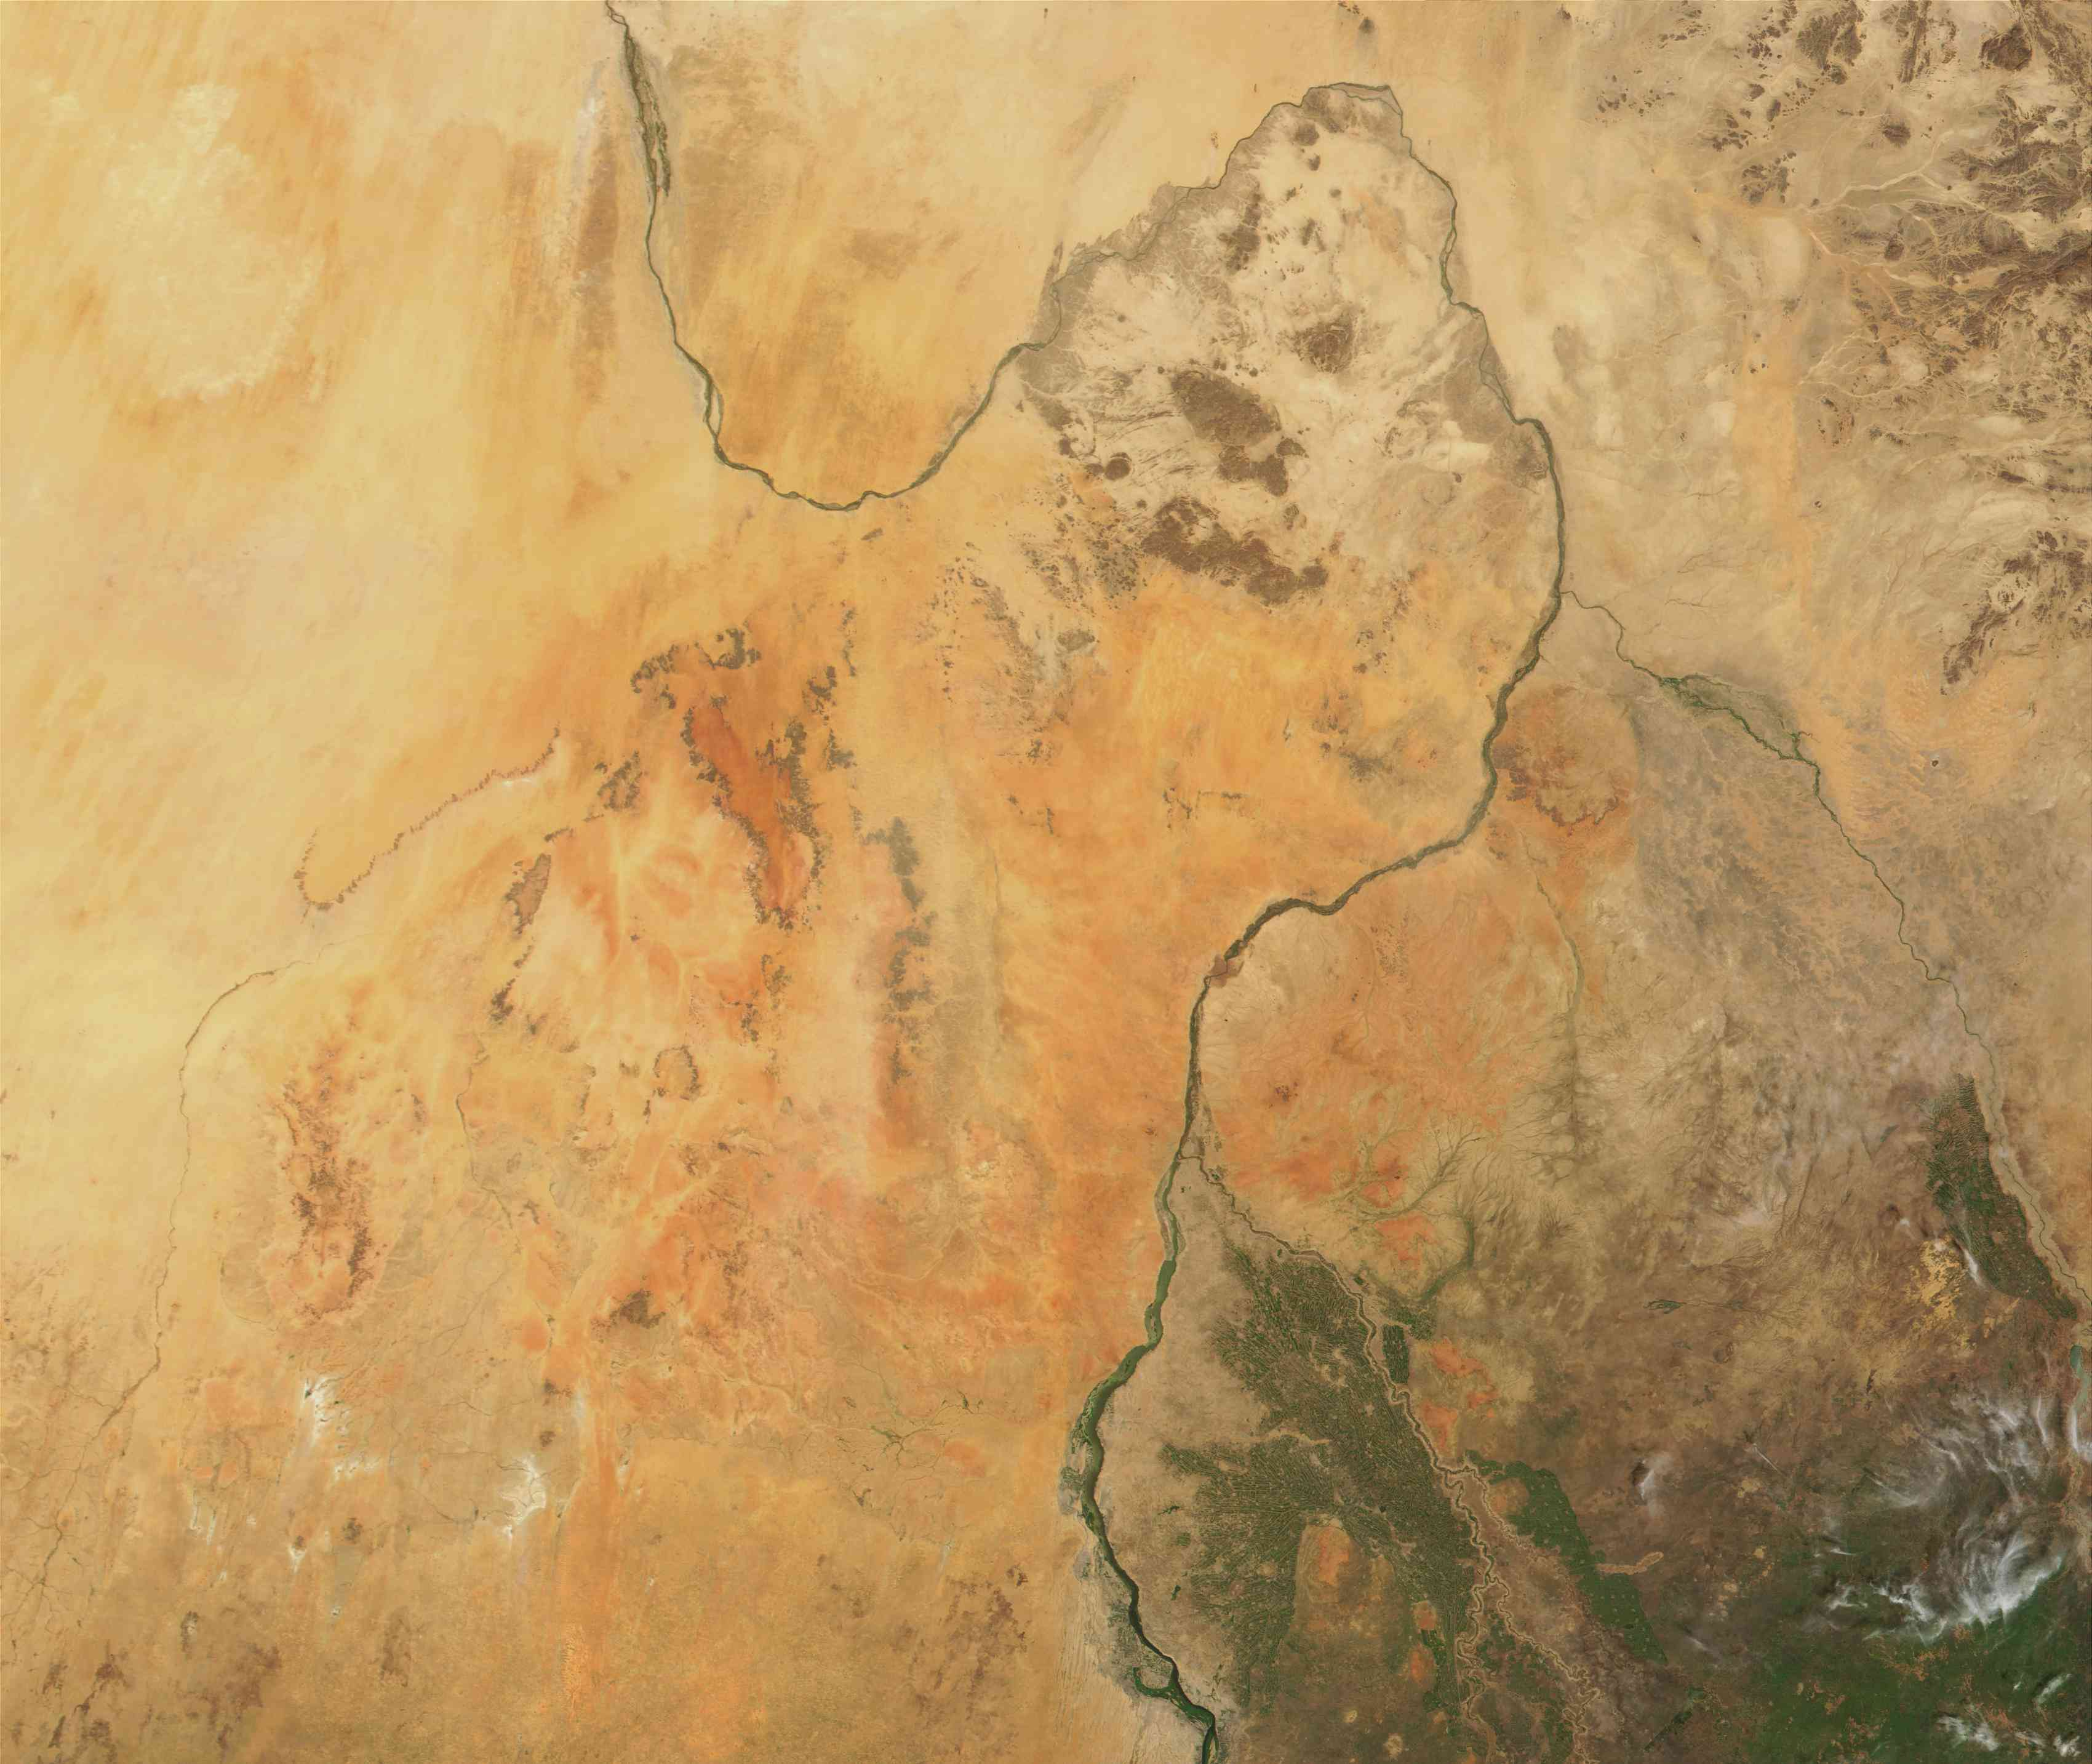 Great Bend of the Nile River in the Sahara desert, Sudan